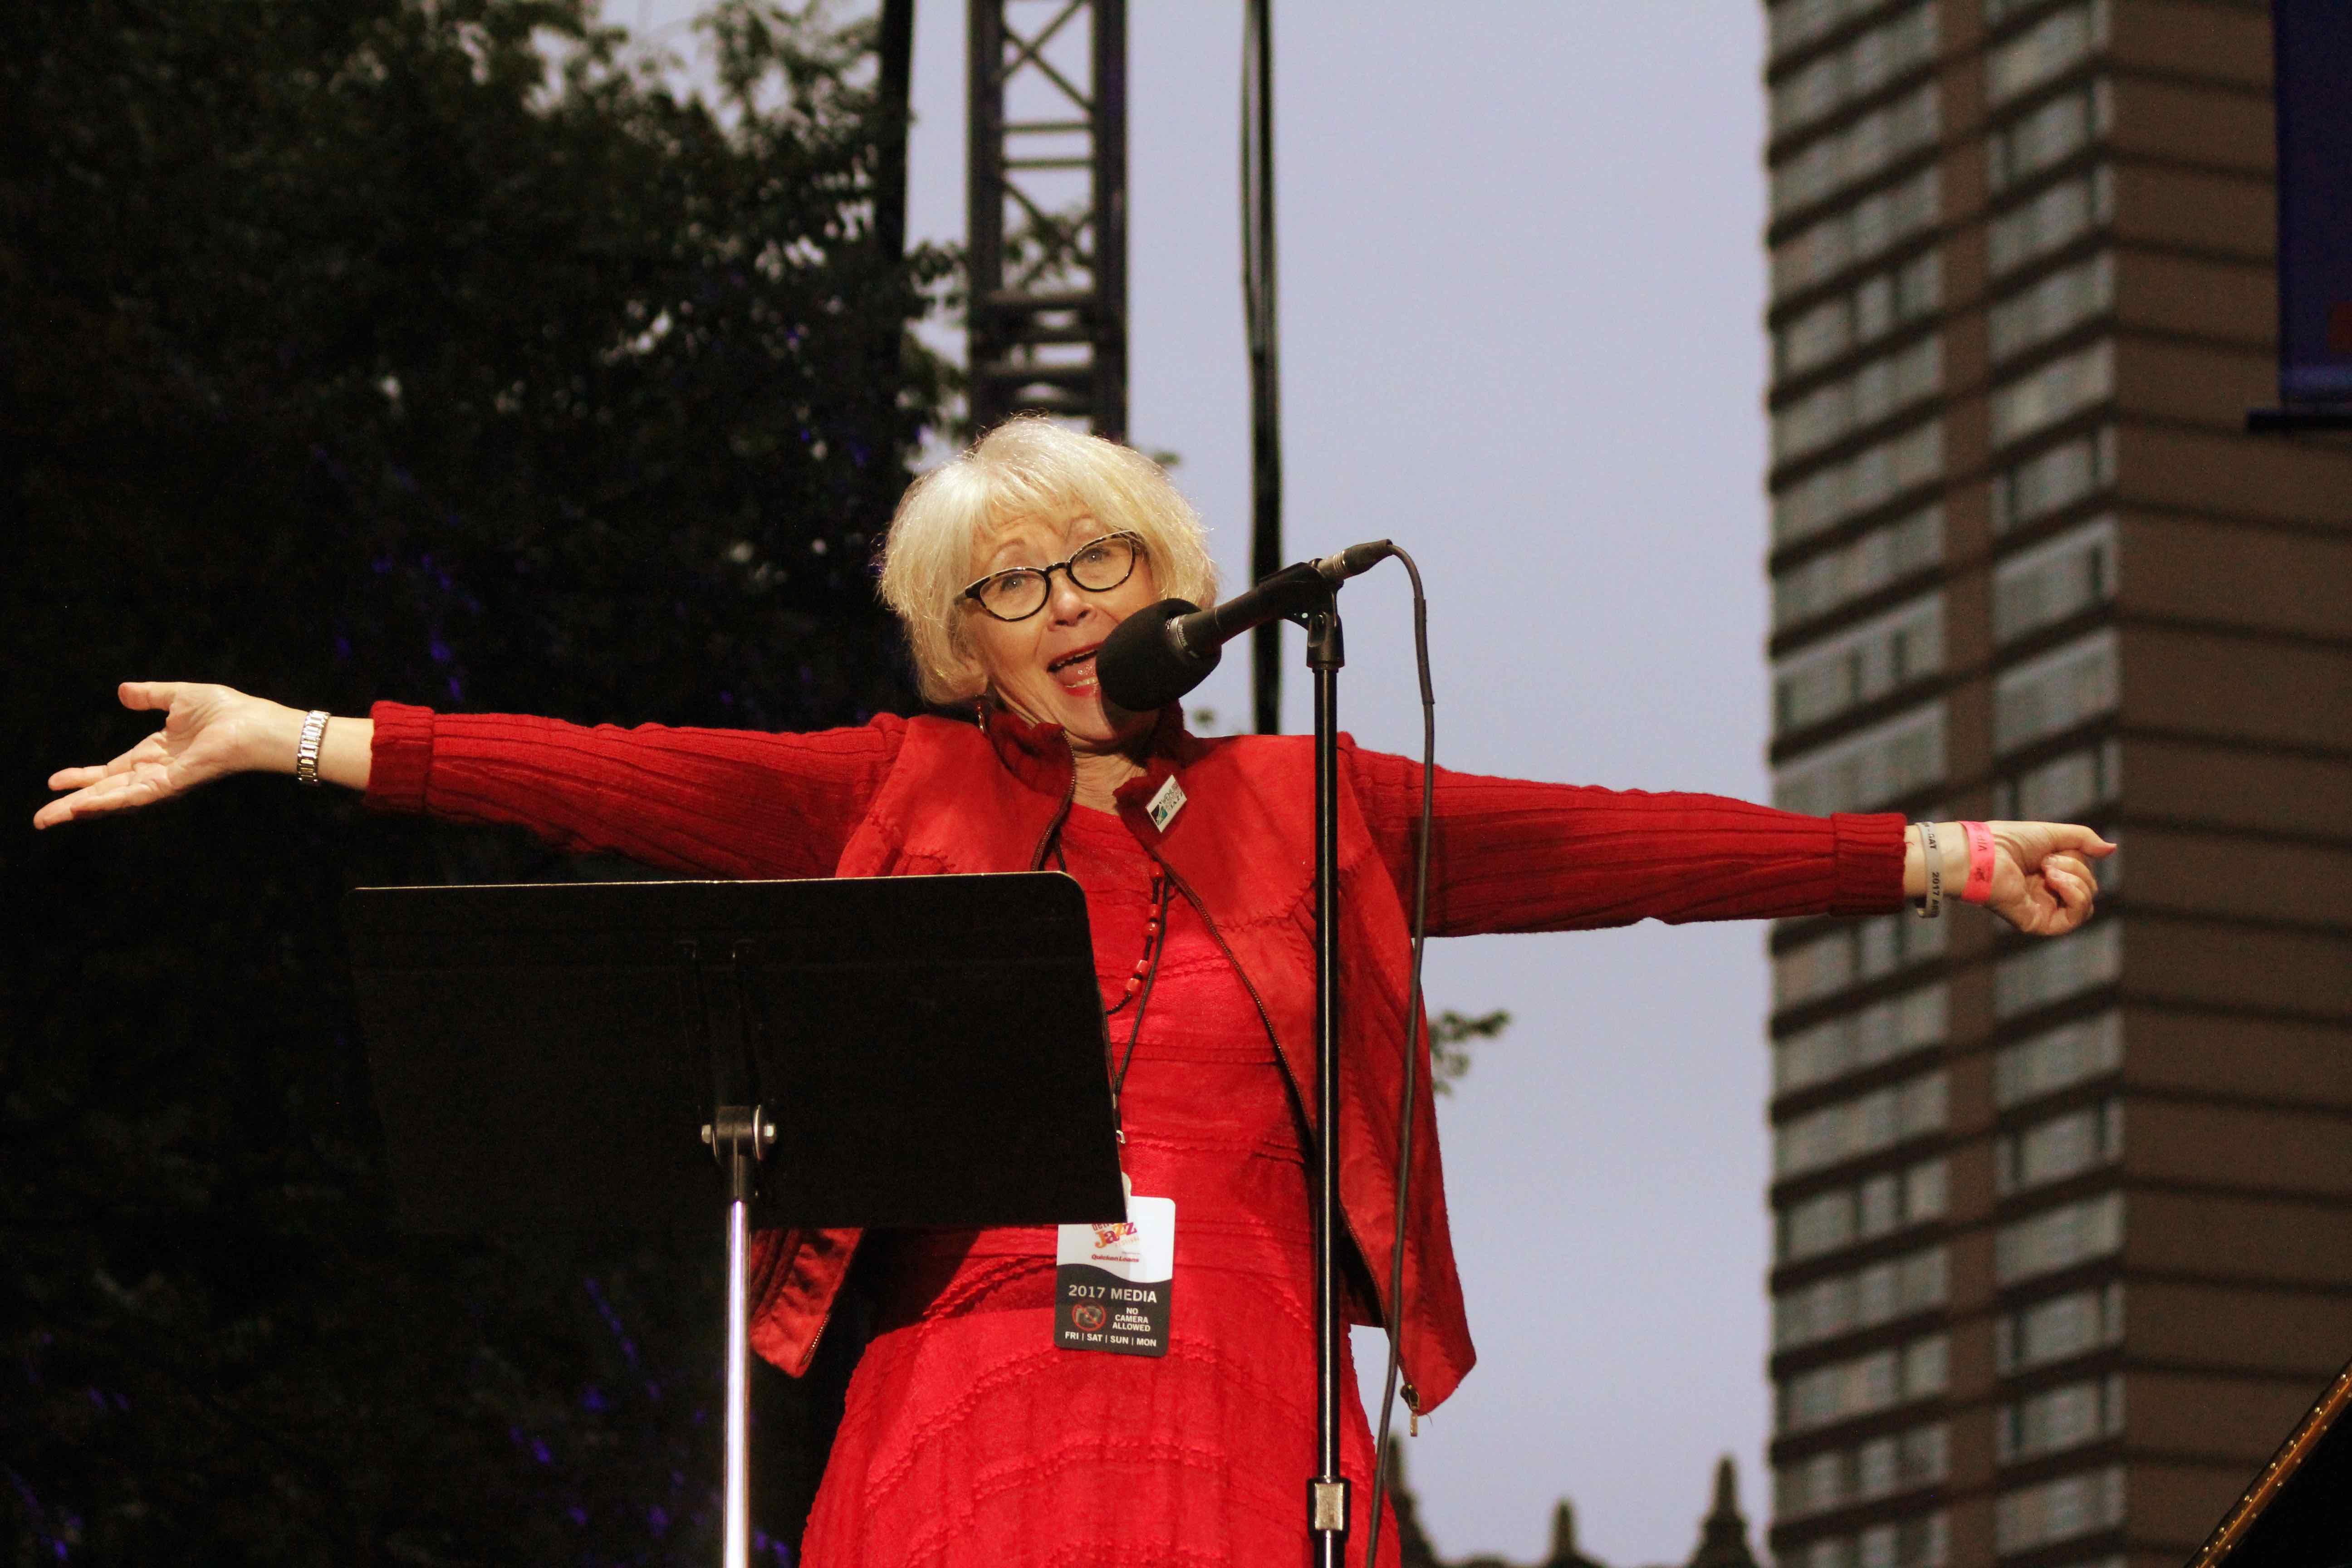 June Joyful Molly